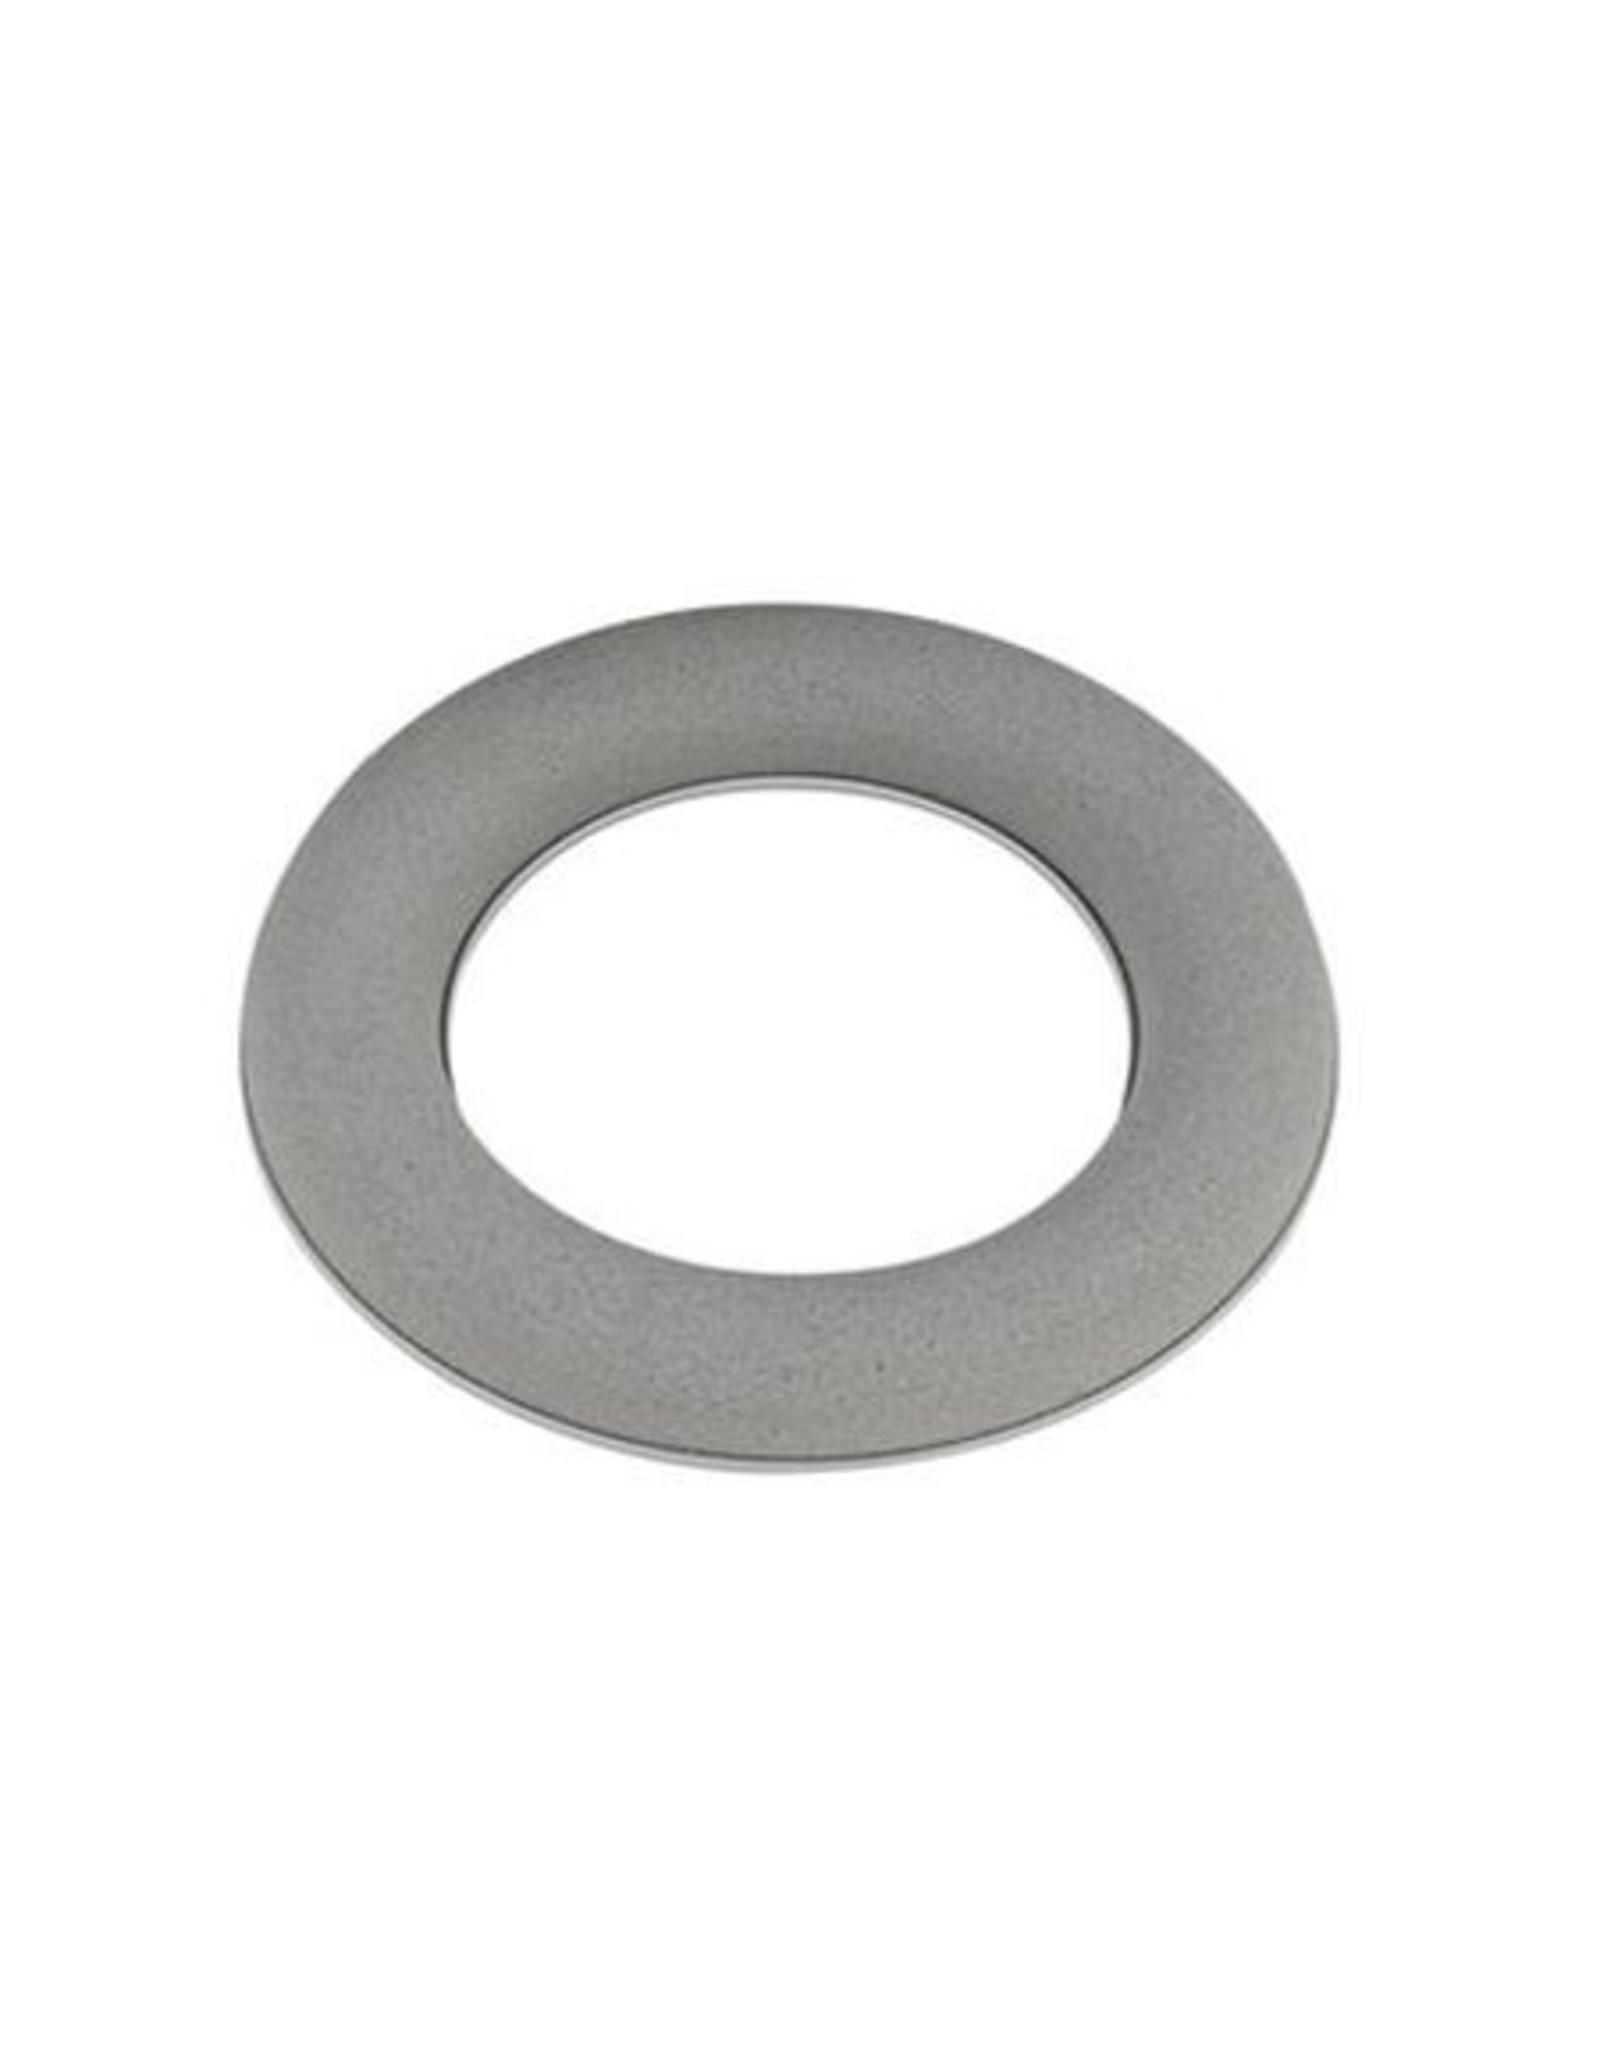 HD Basic Ring Sld Dry Foam D30.0 x 20